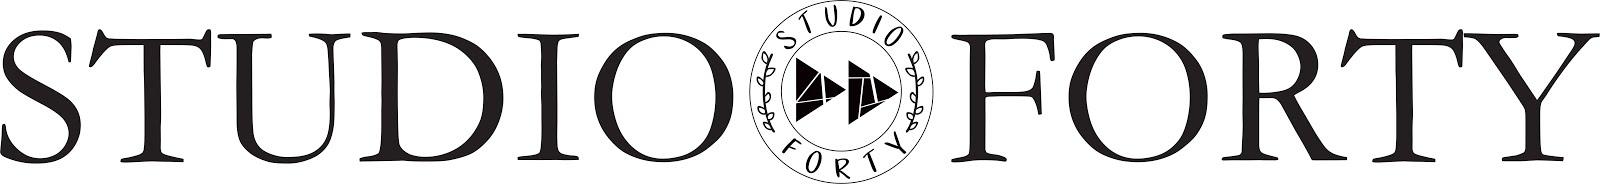 StudioForty